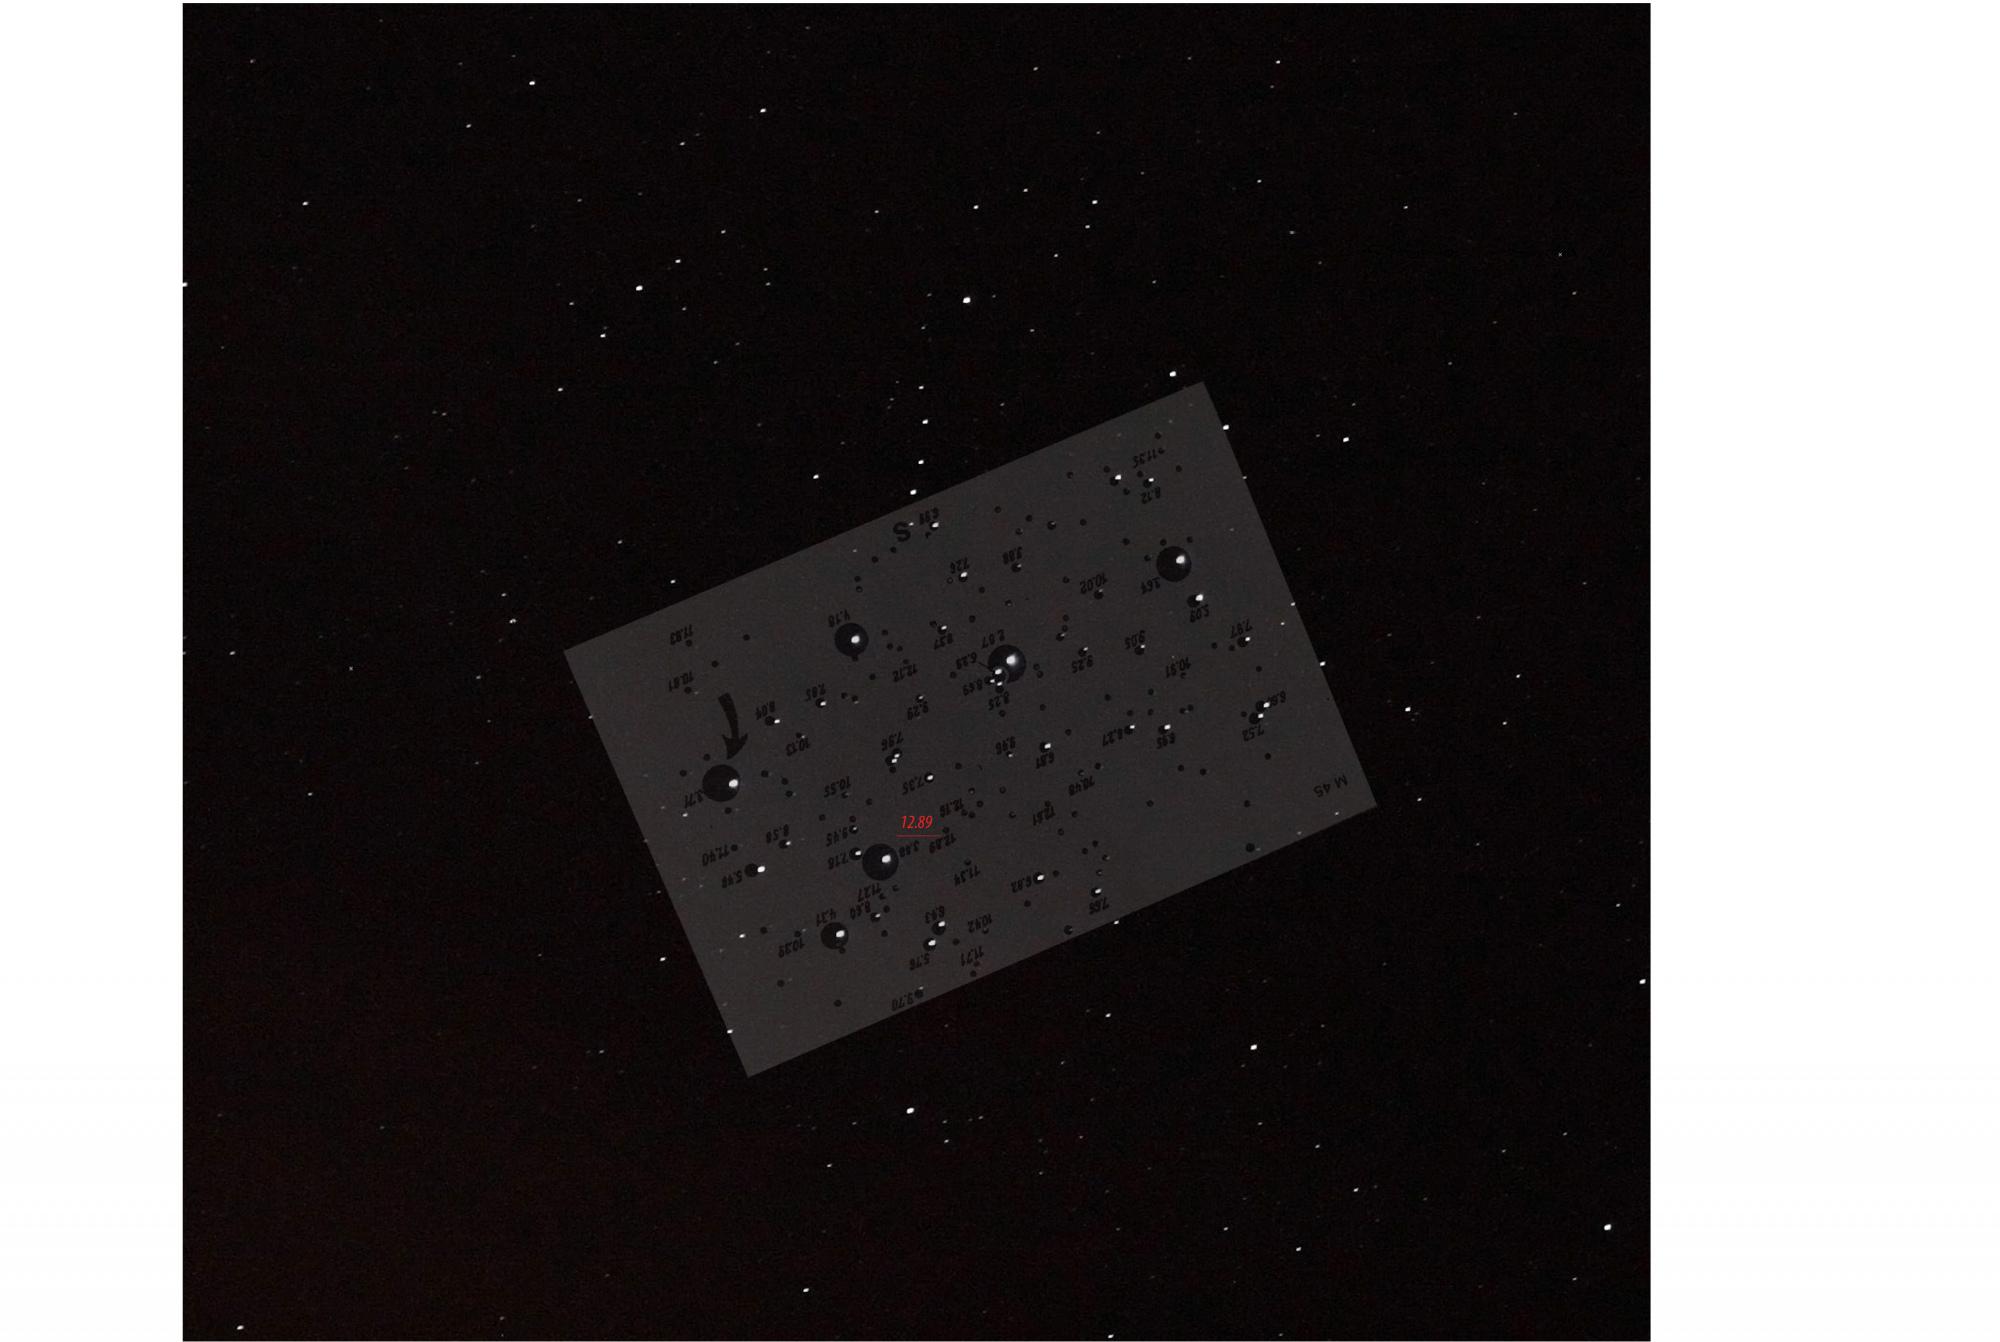 1-Pleiades+carte.jpg